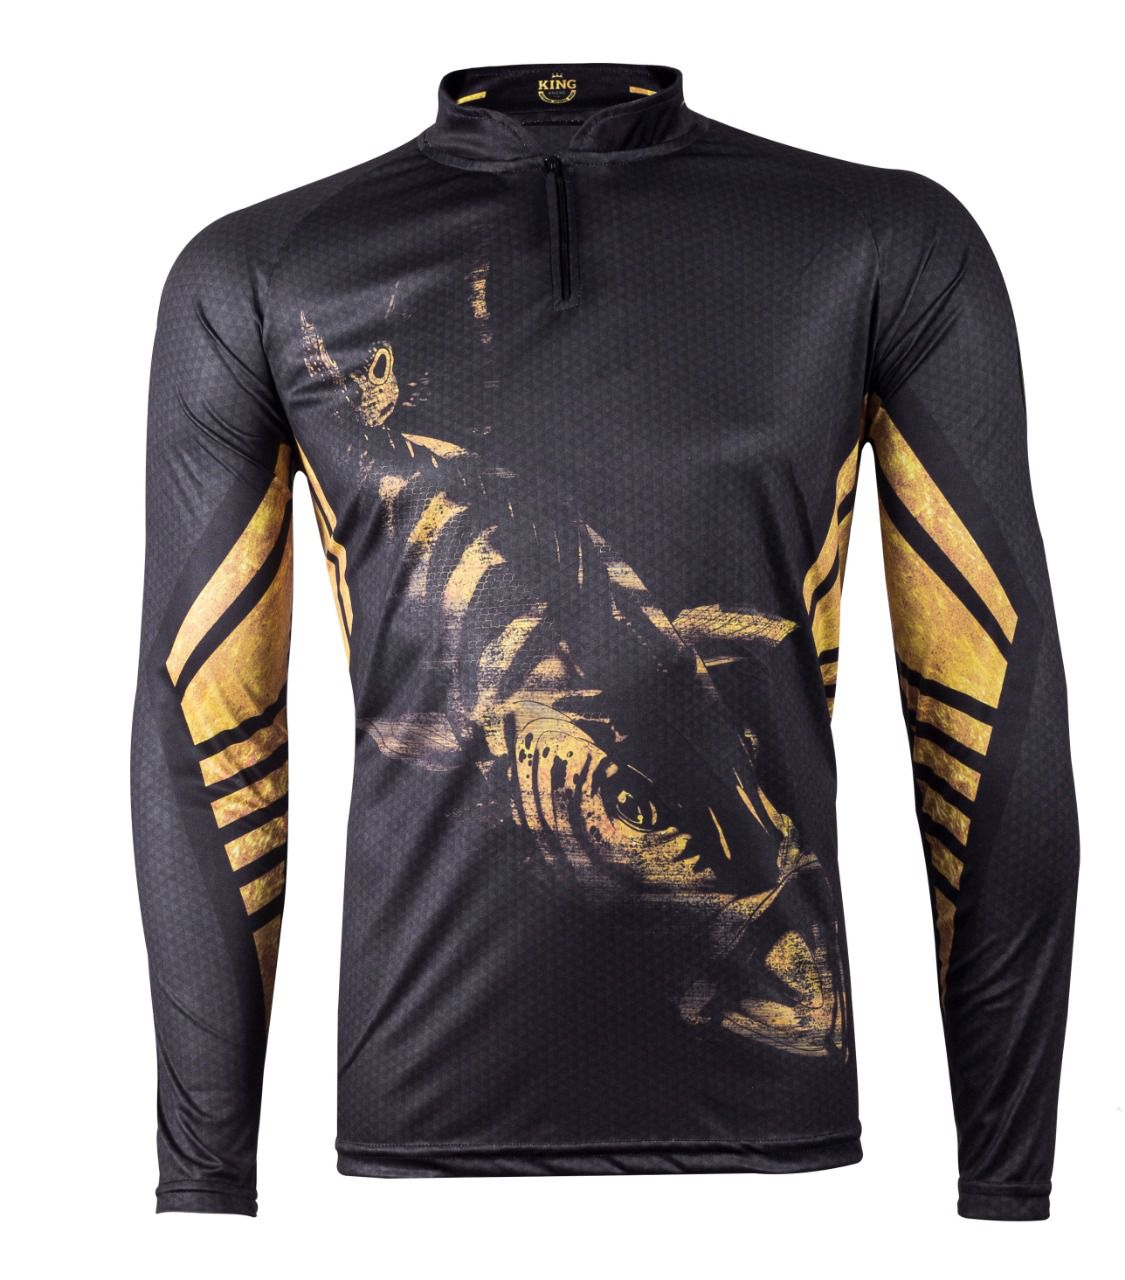 Camiseta King Sublimada Viking 10 Tucunaré  - Comprando & Pescando